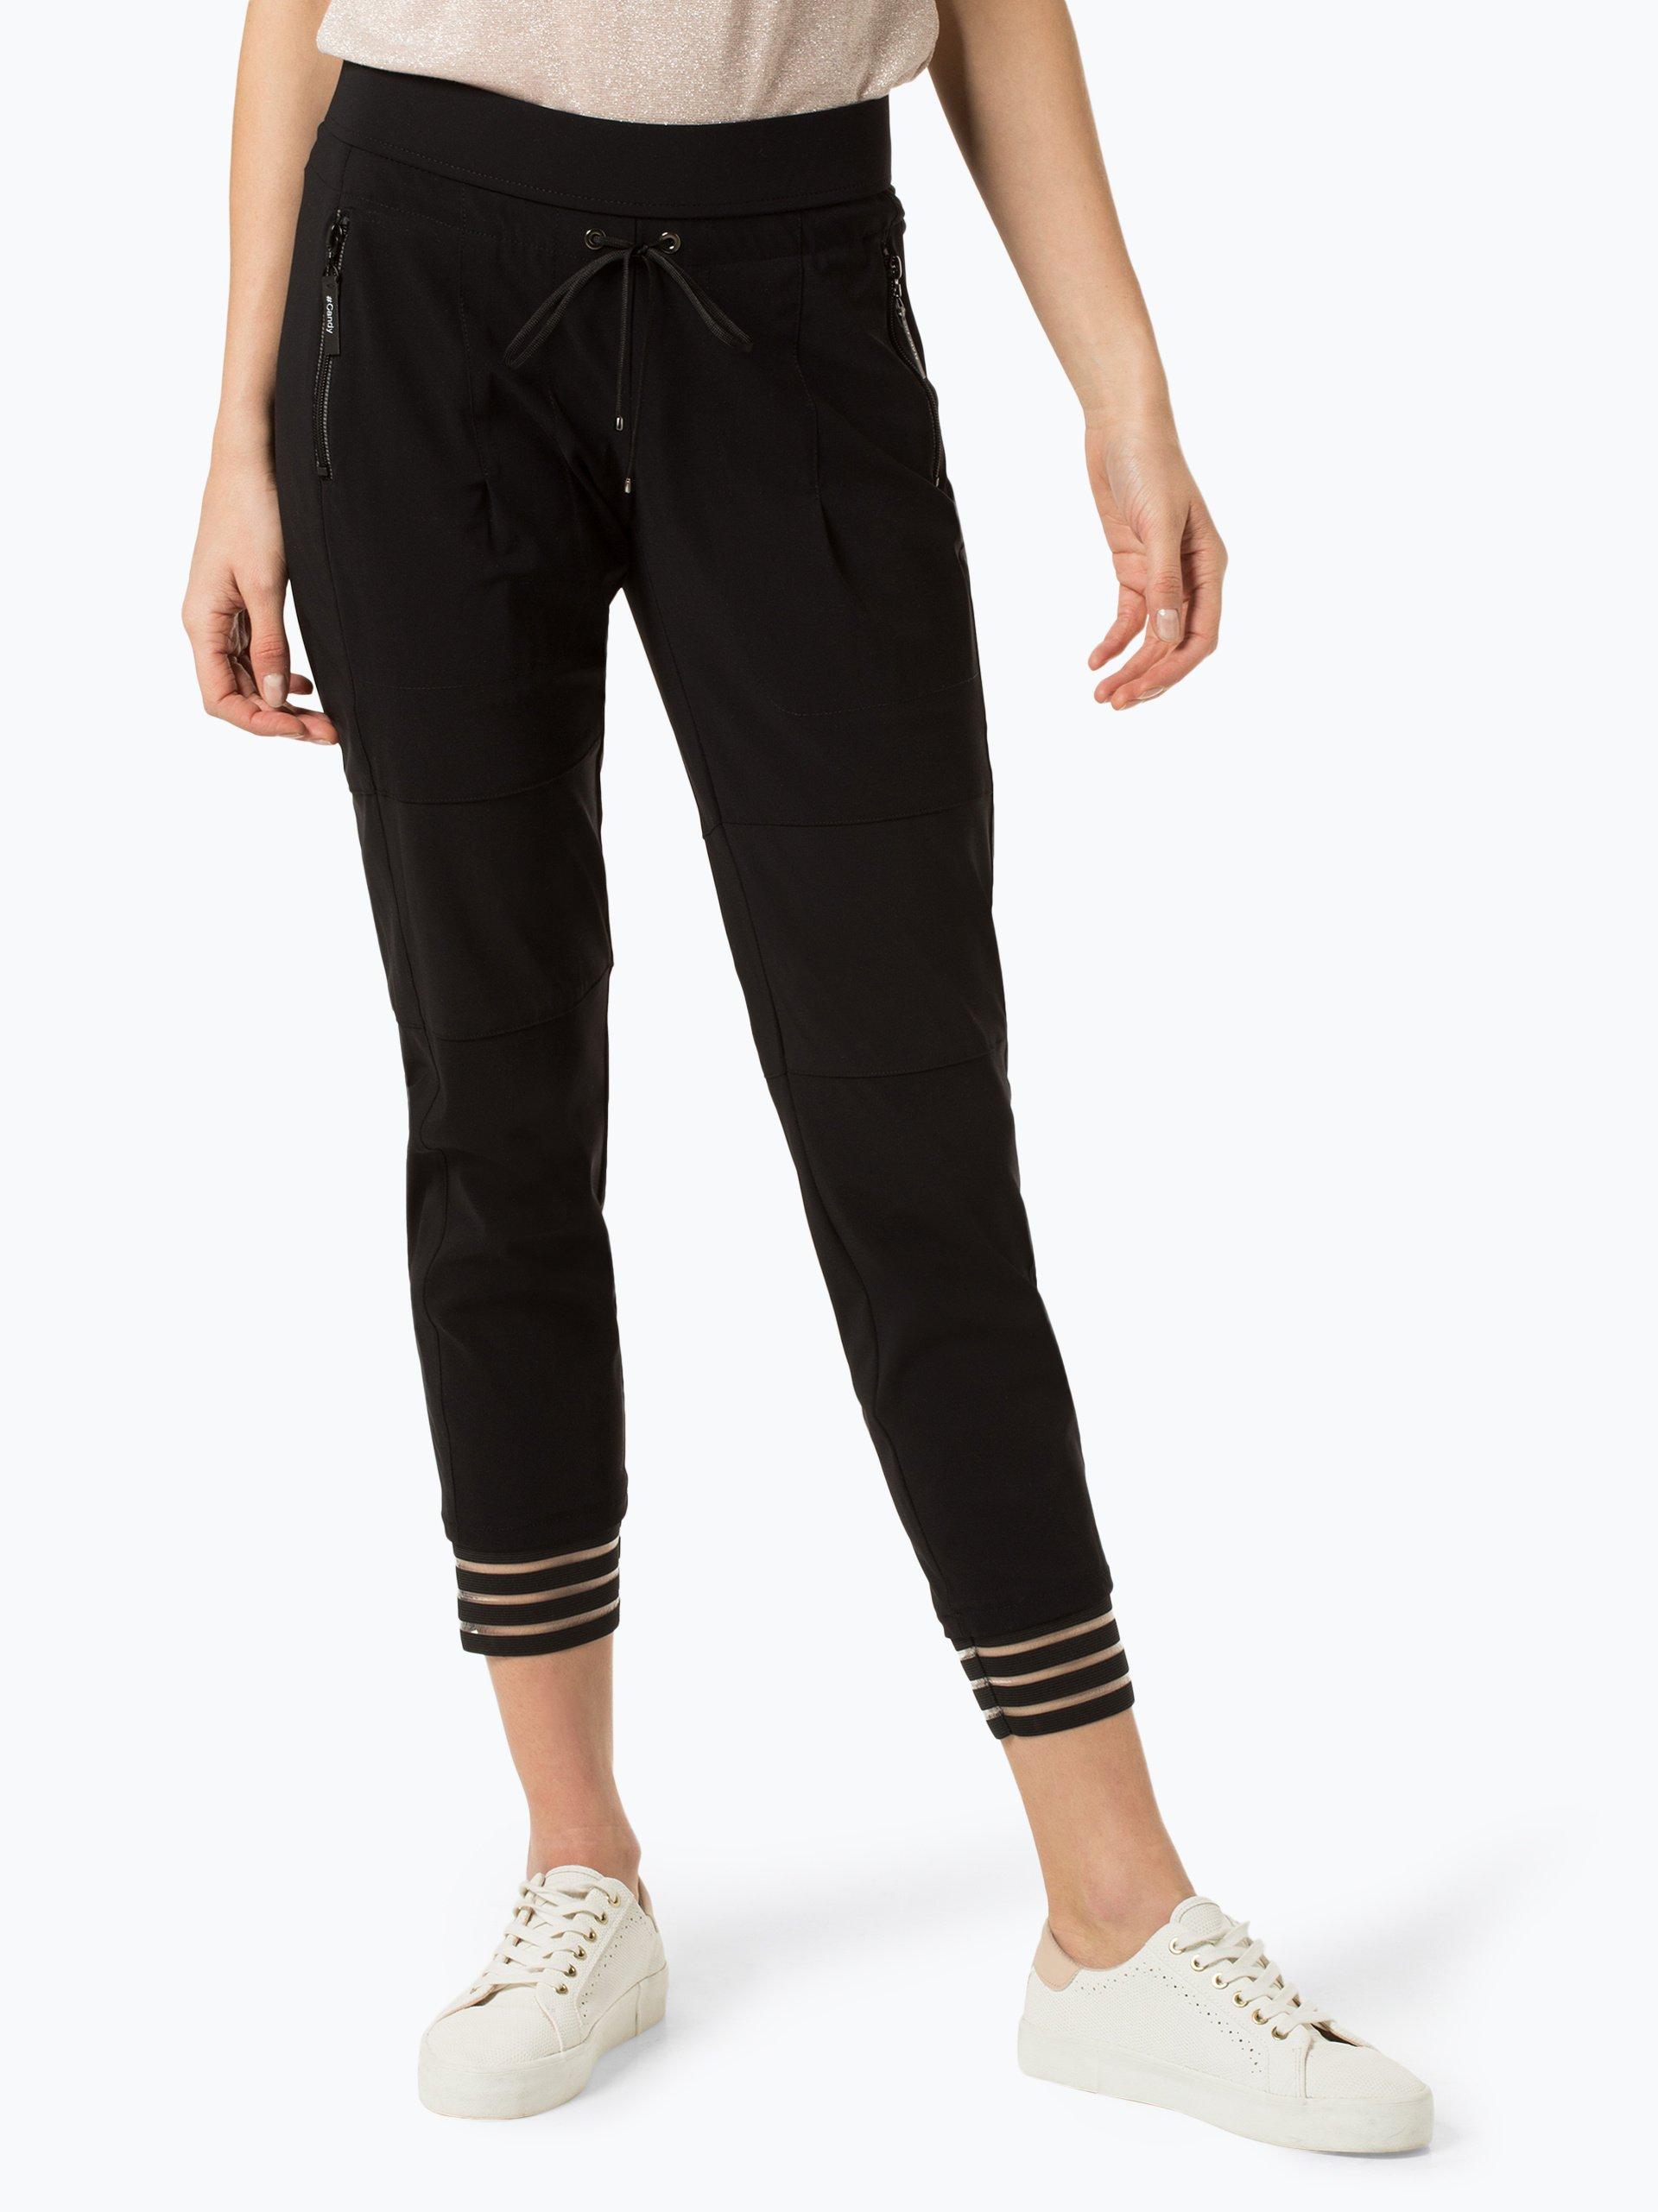 RAFFAELLO ROSSI Damen Sportswear Hose Candy Future online